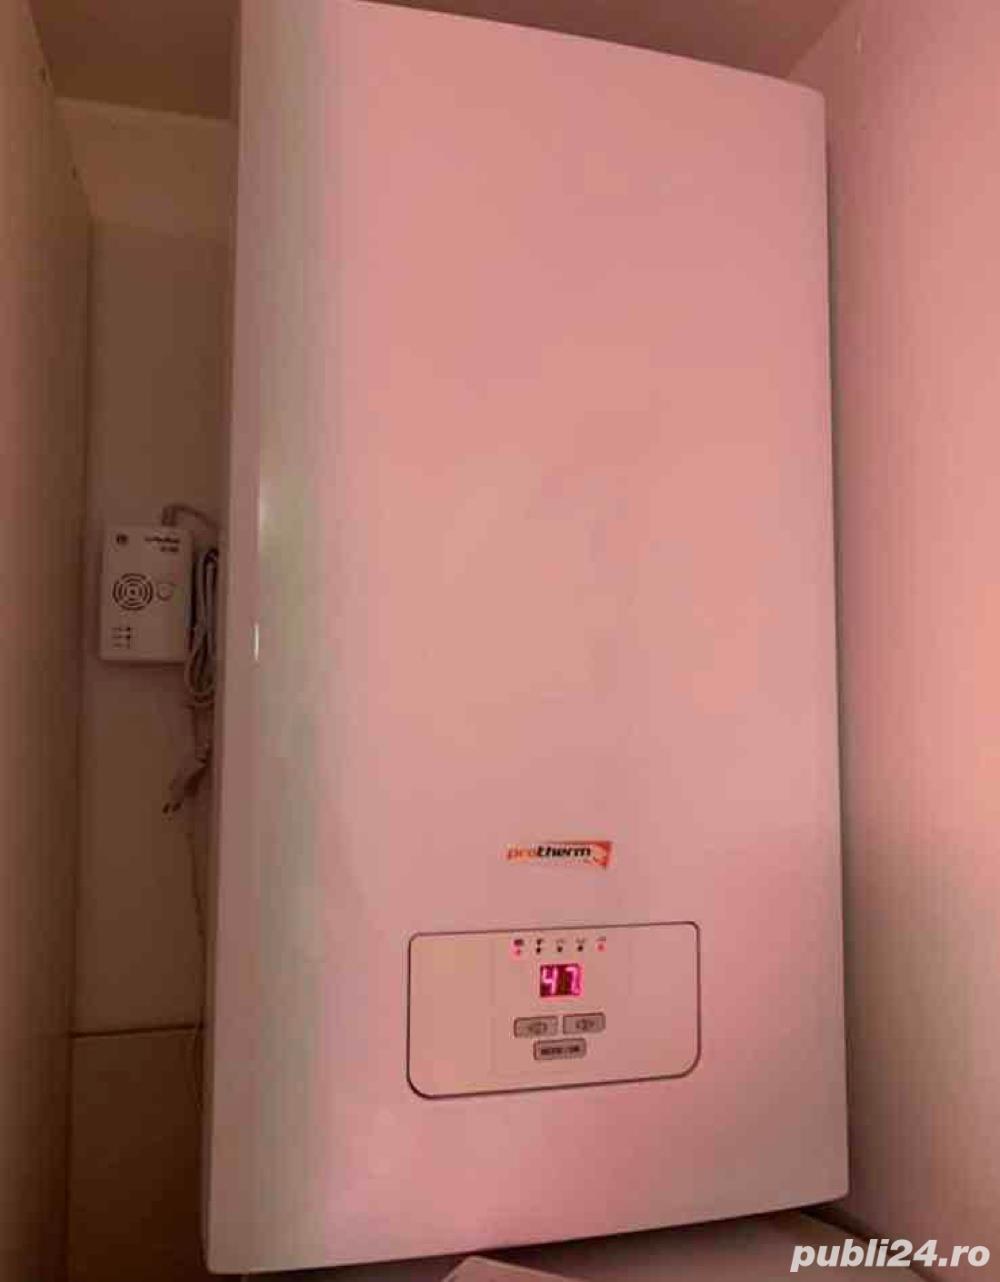 Vand centrala termica electrica Protherm si boiler 200 litri